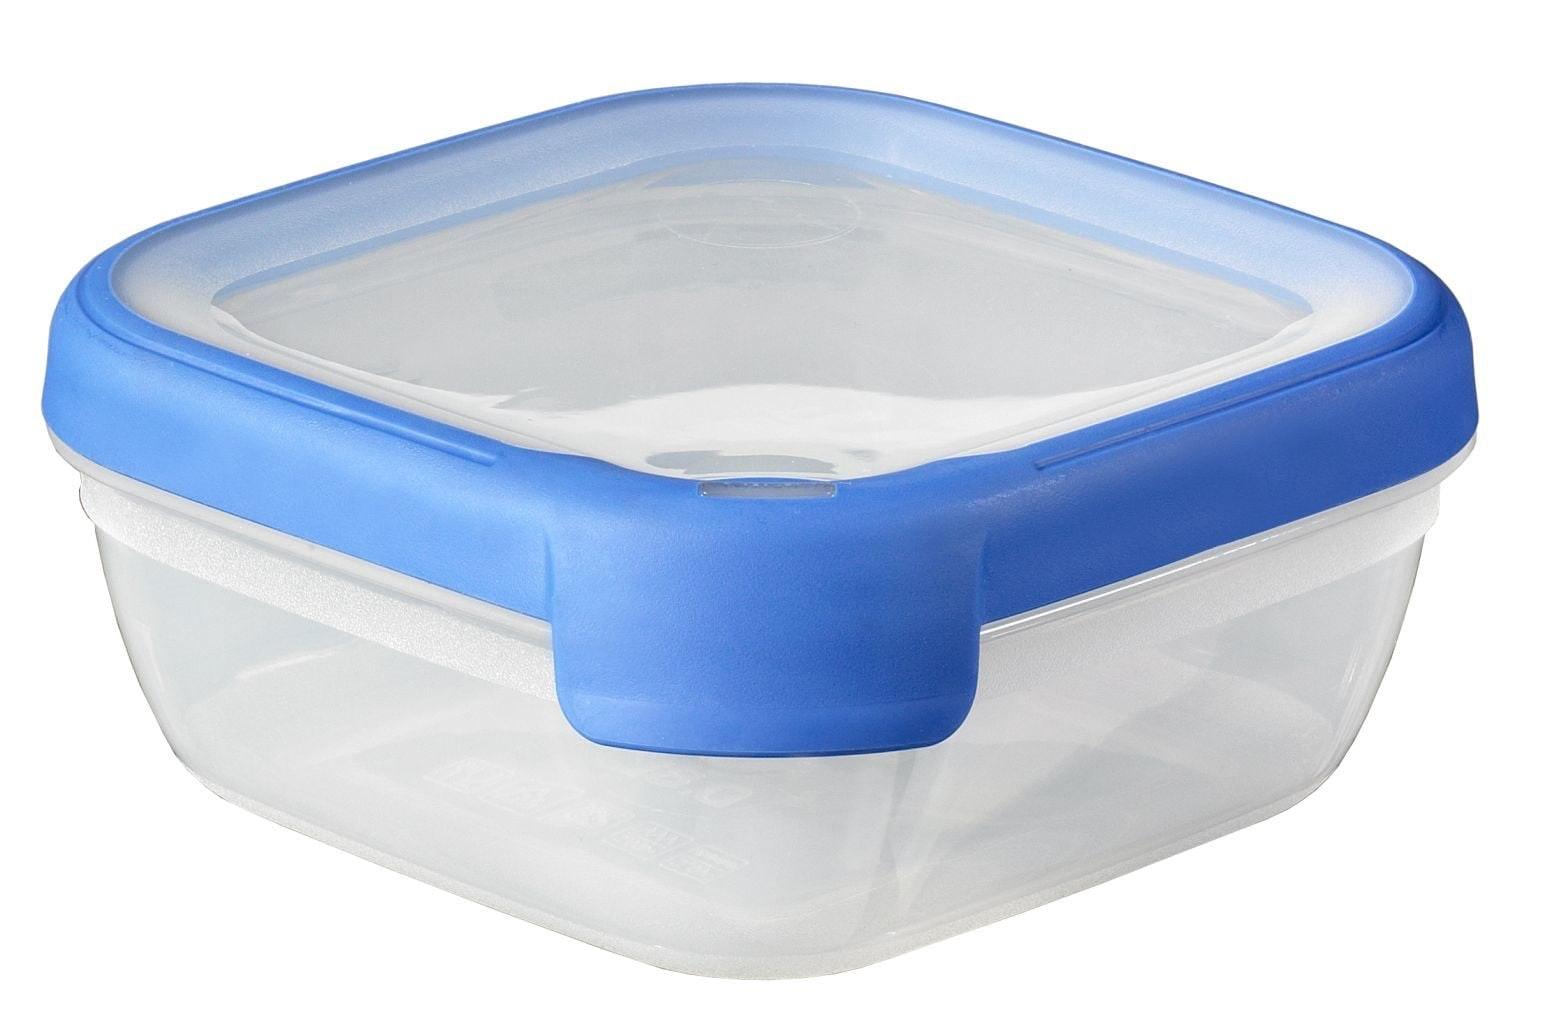 Vershouddoos Grandchef Vierkant 0,75 lt Transparant blauw Curver